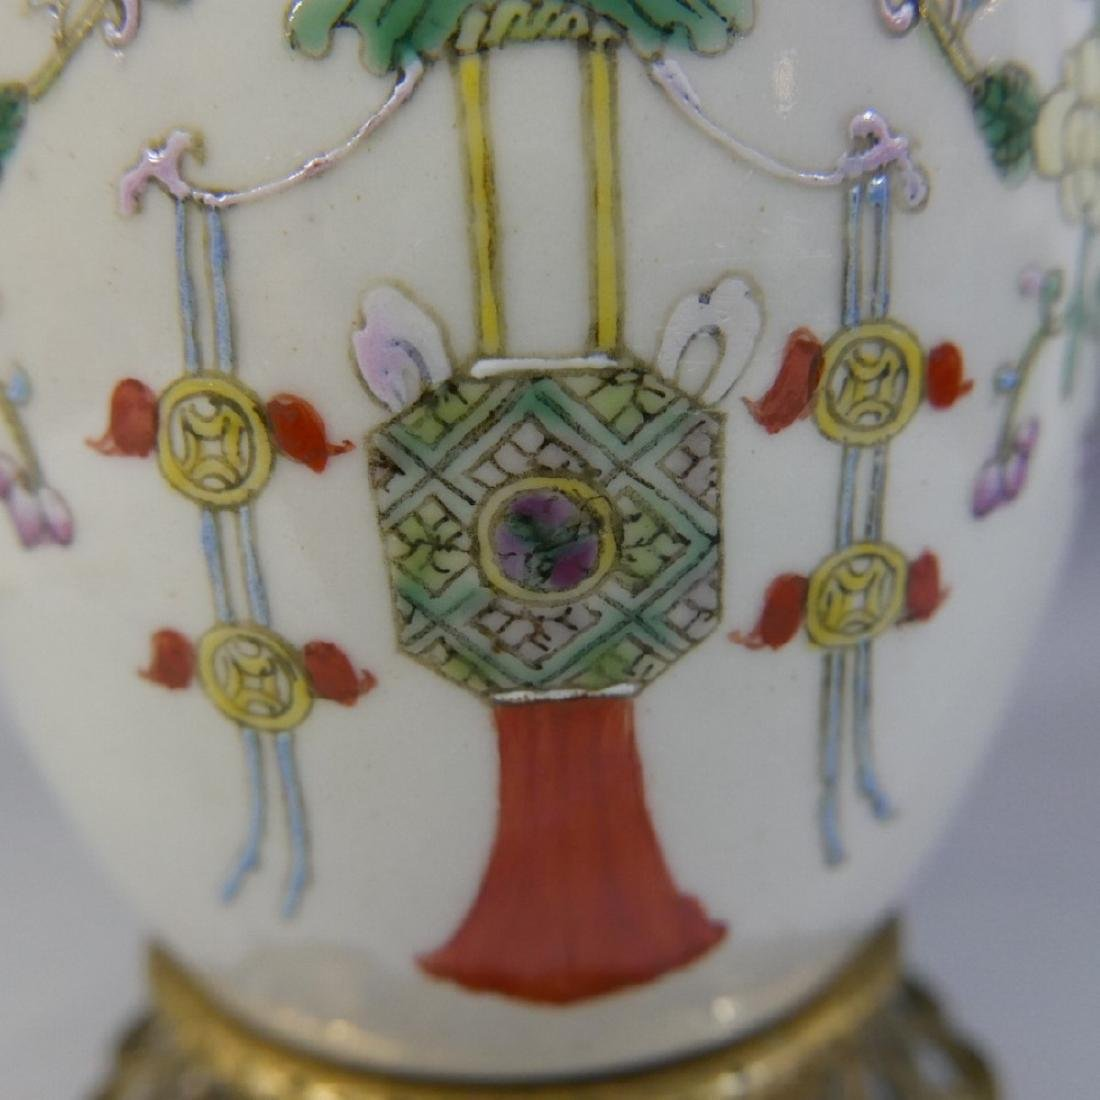 ANTIQUE CHINESE FAMILLE ROSE PORCELAIN VASE - QING - 3